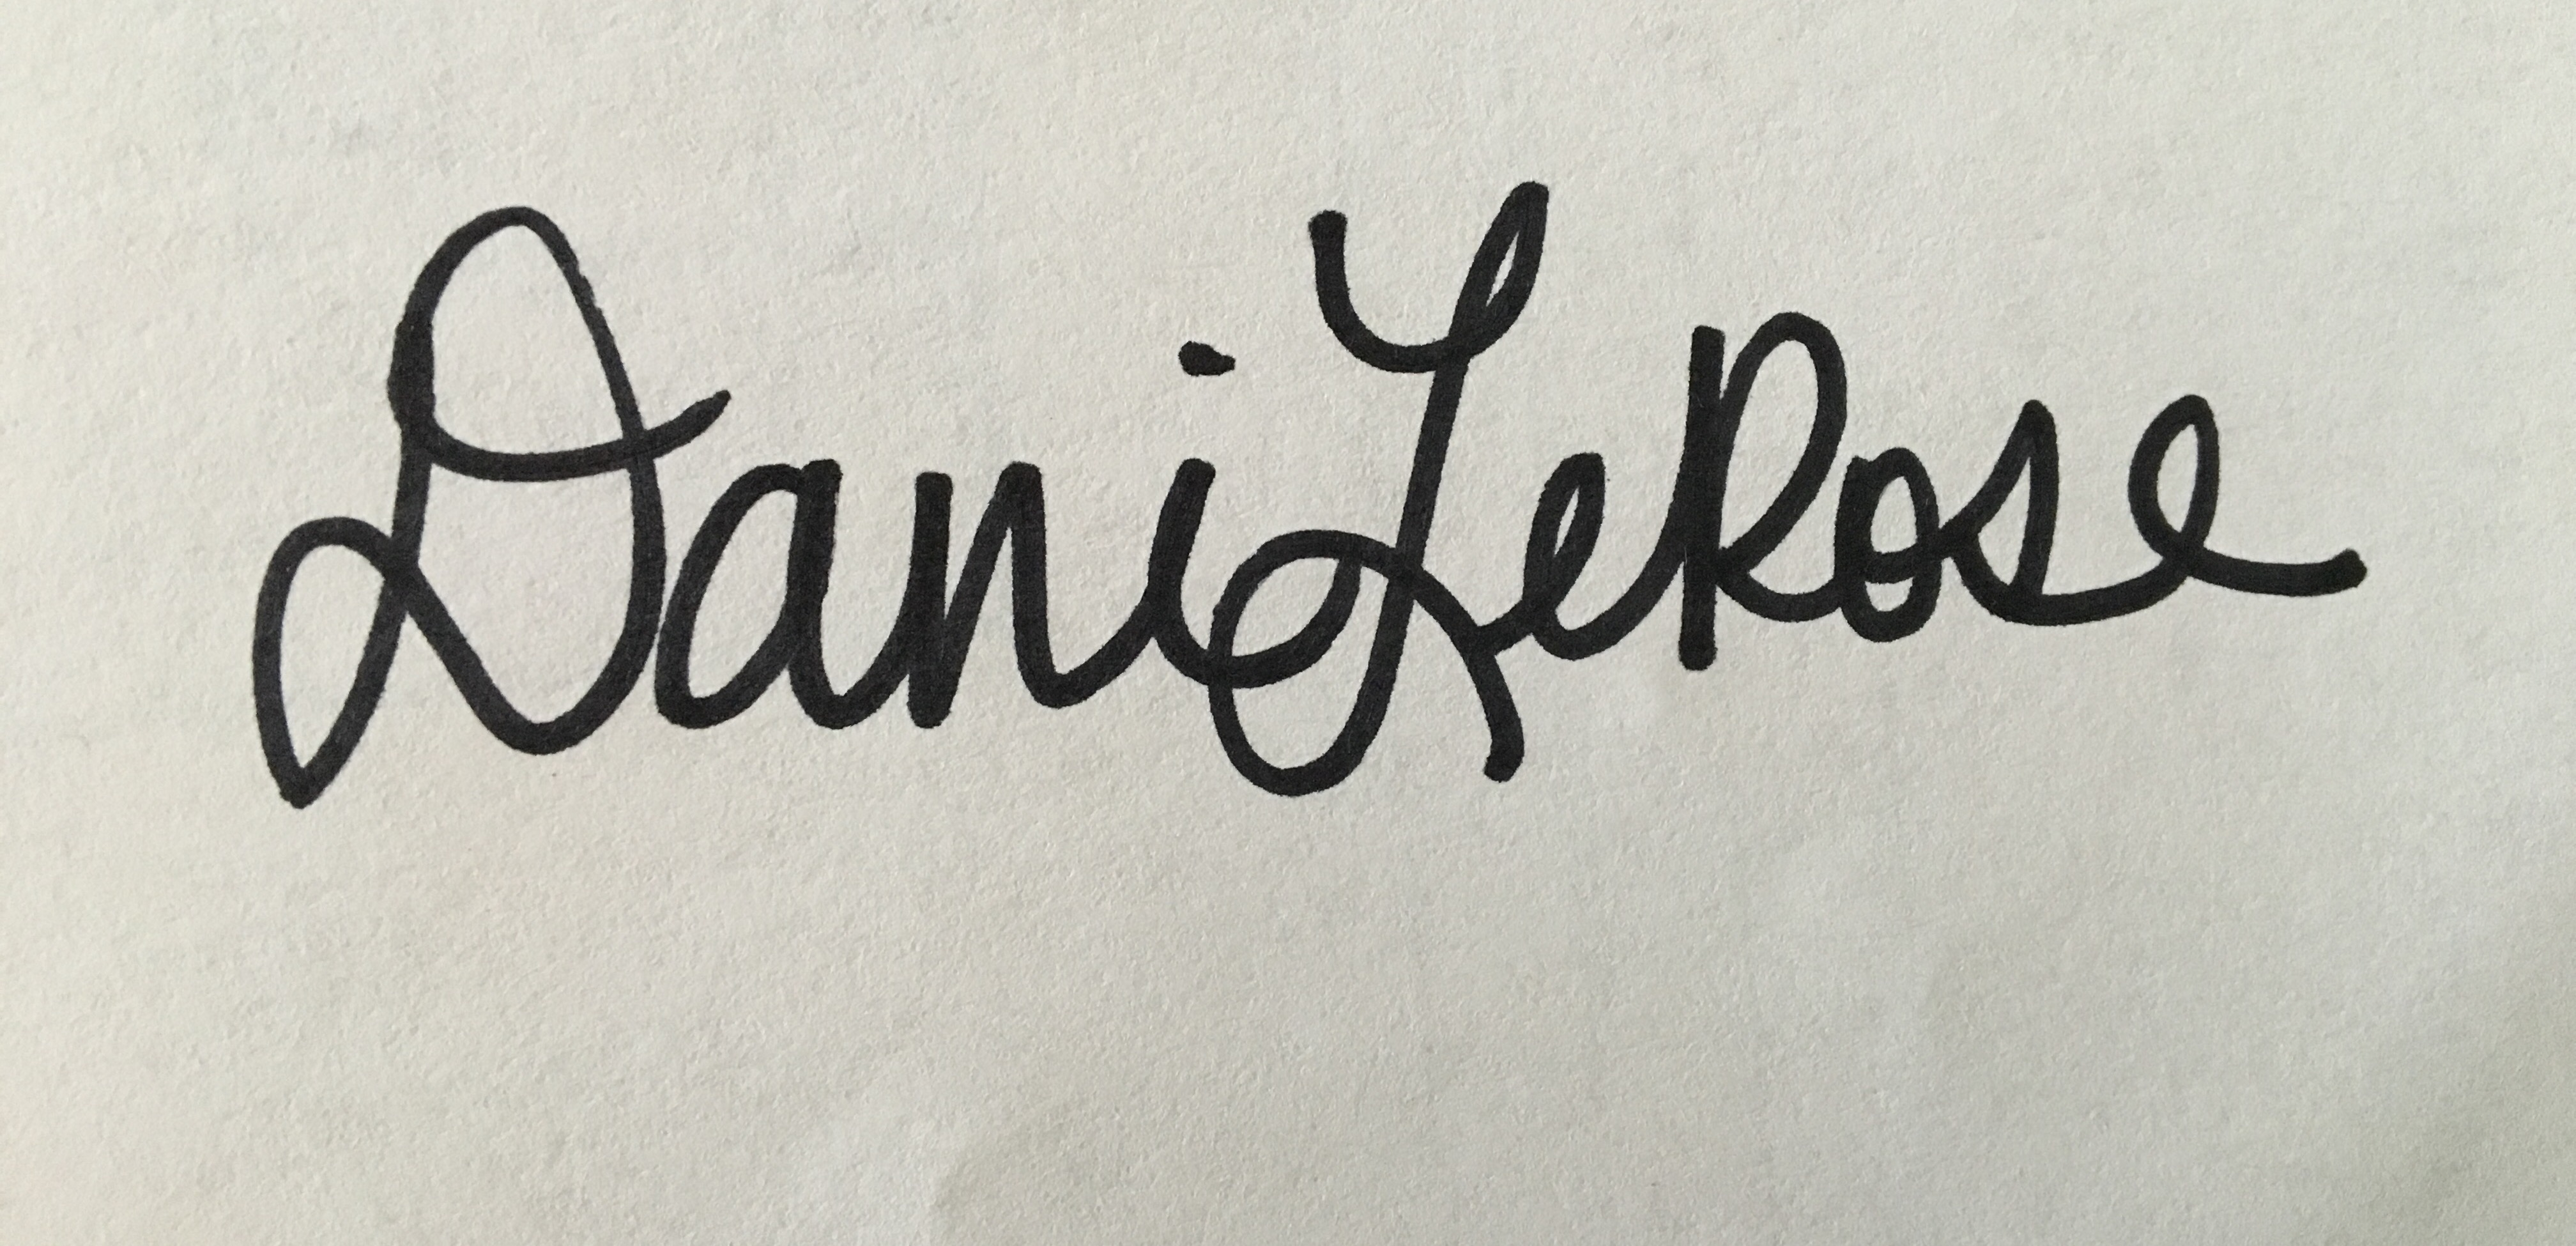 Dani LeRose's Signature